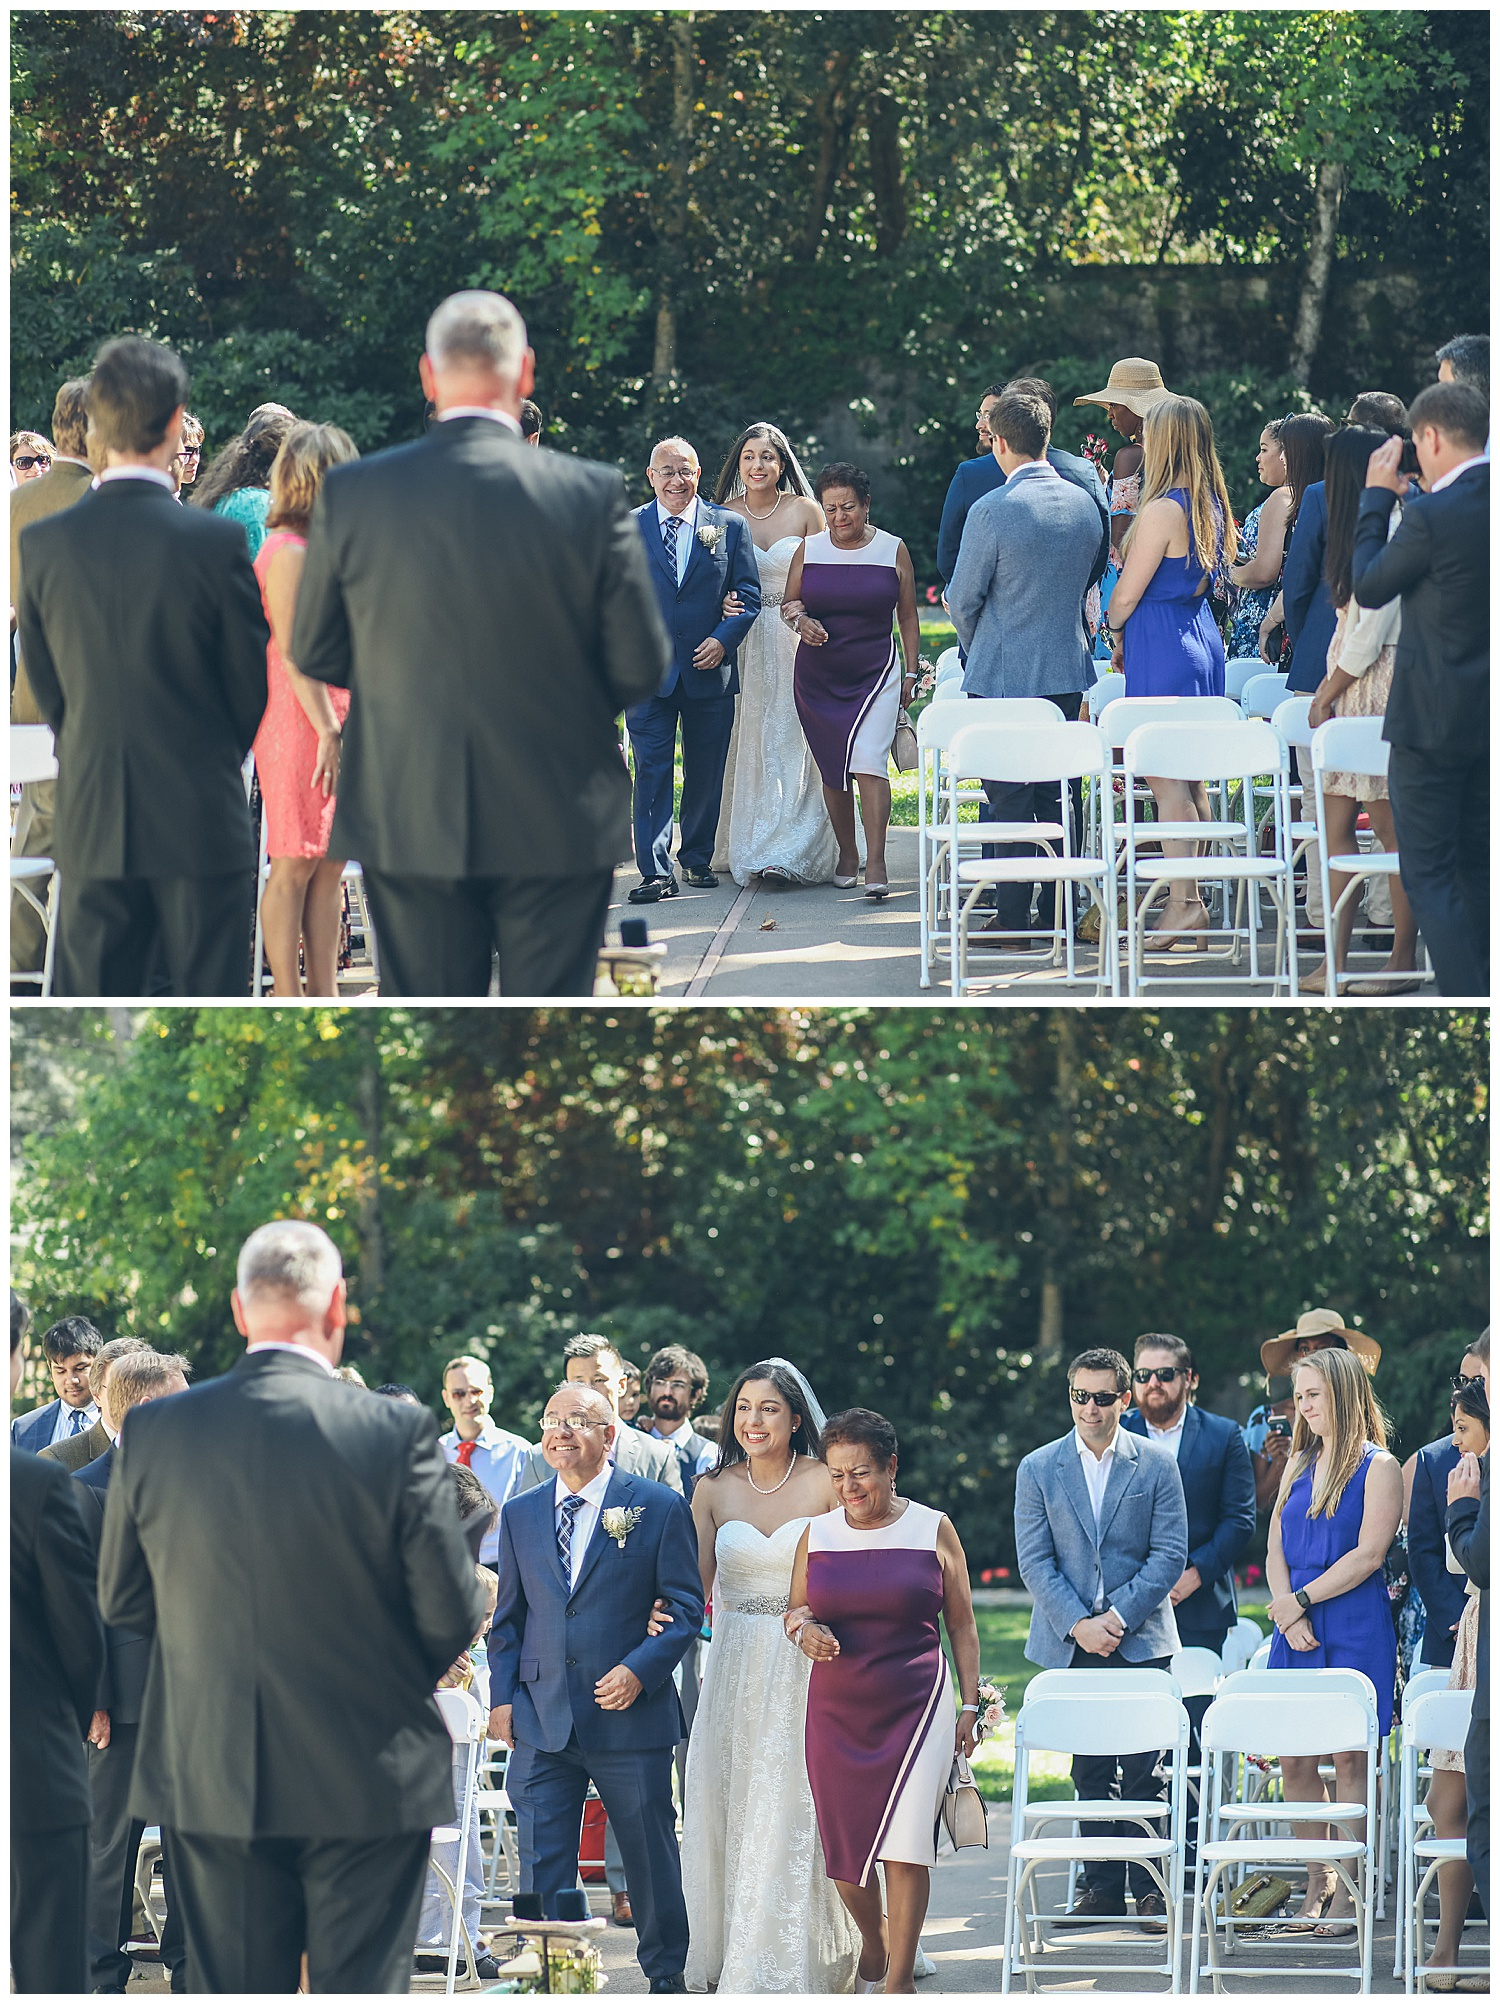 khariza-rae-photography-bay-area-wedding-photographer_0132.jpg